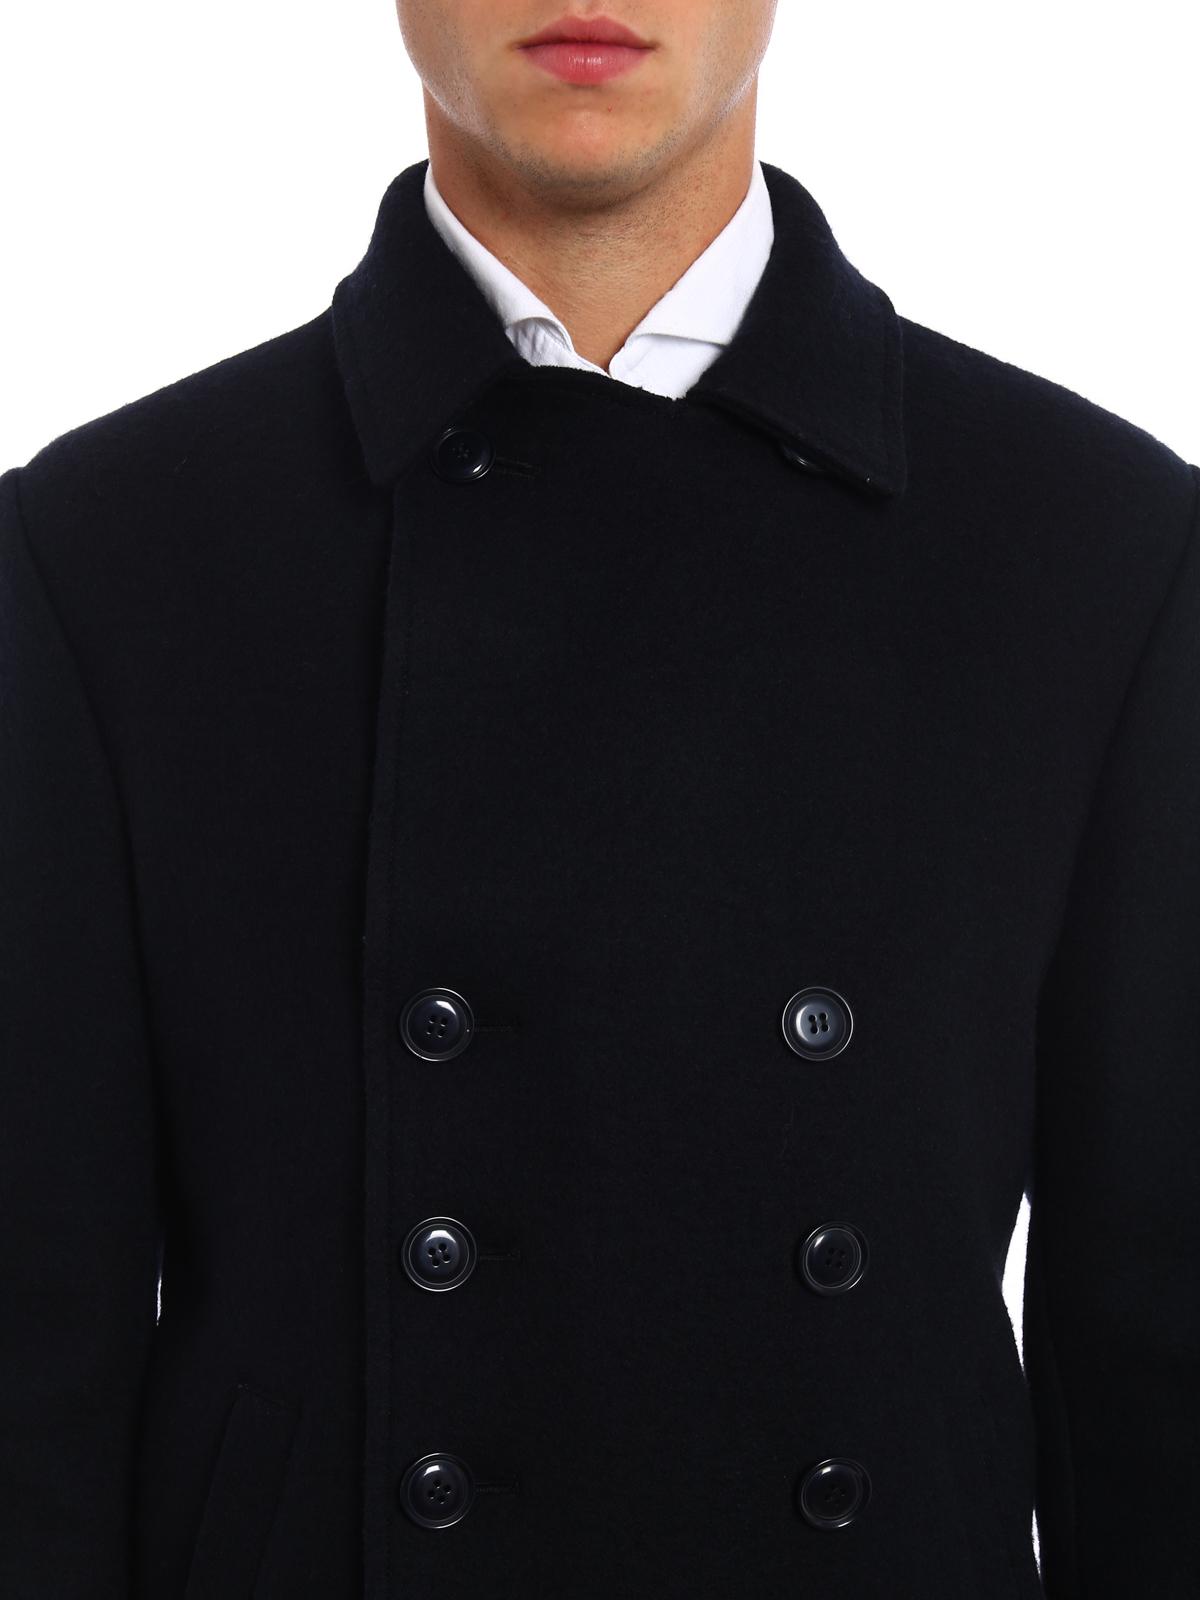 new arrival 3829e 260a2 Aspesi - Caban in lana cotta - giacche casual ...